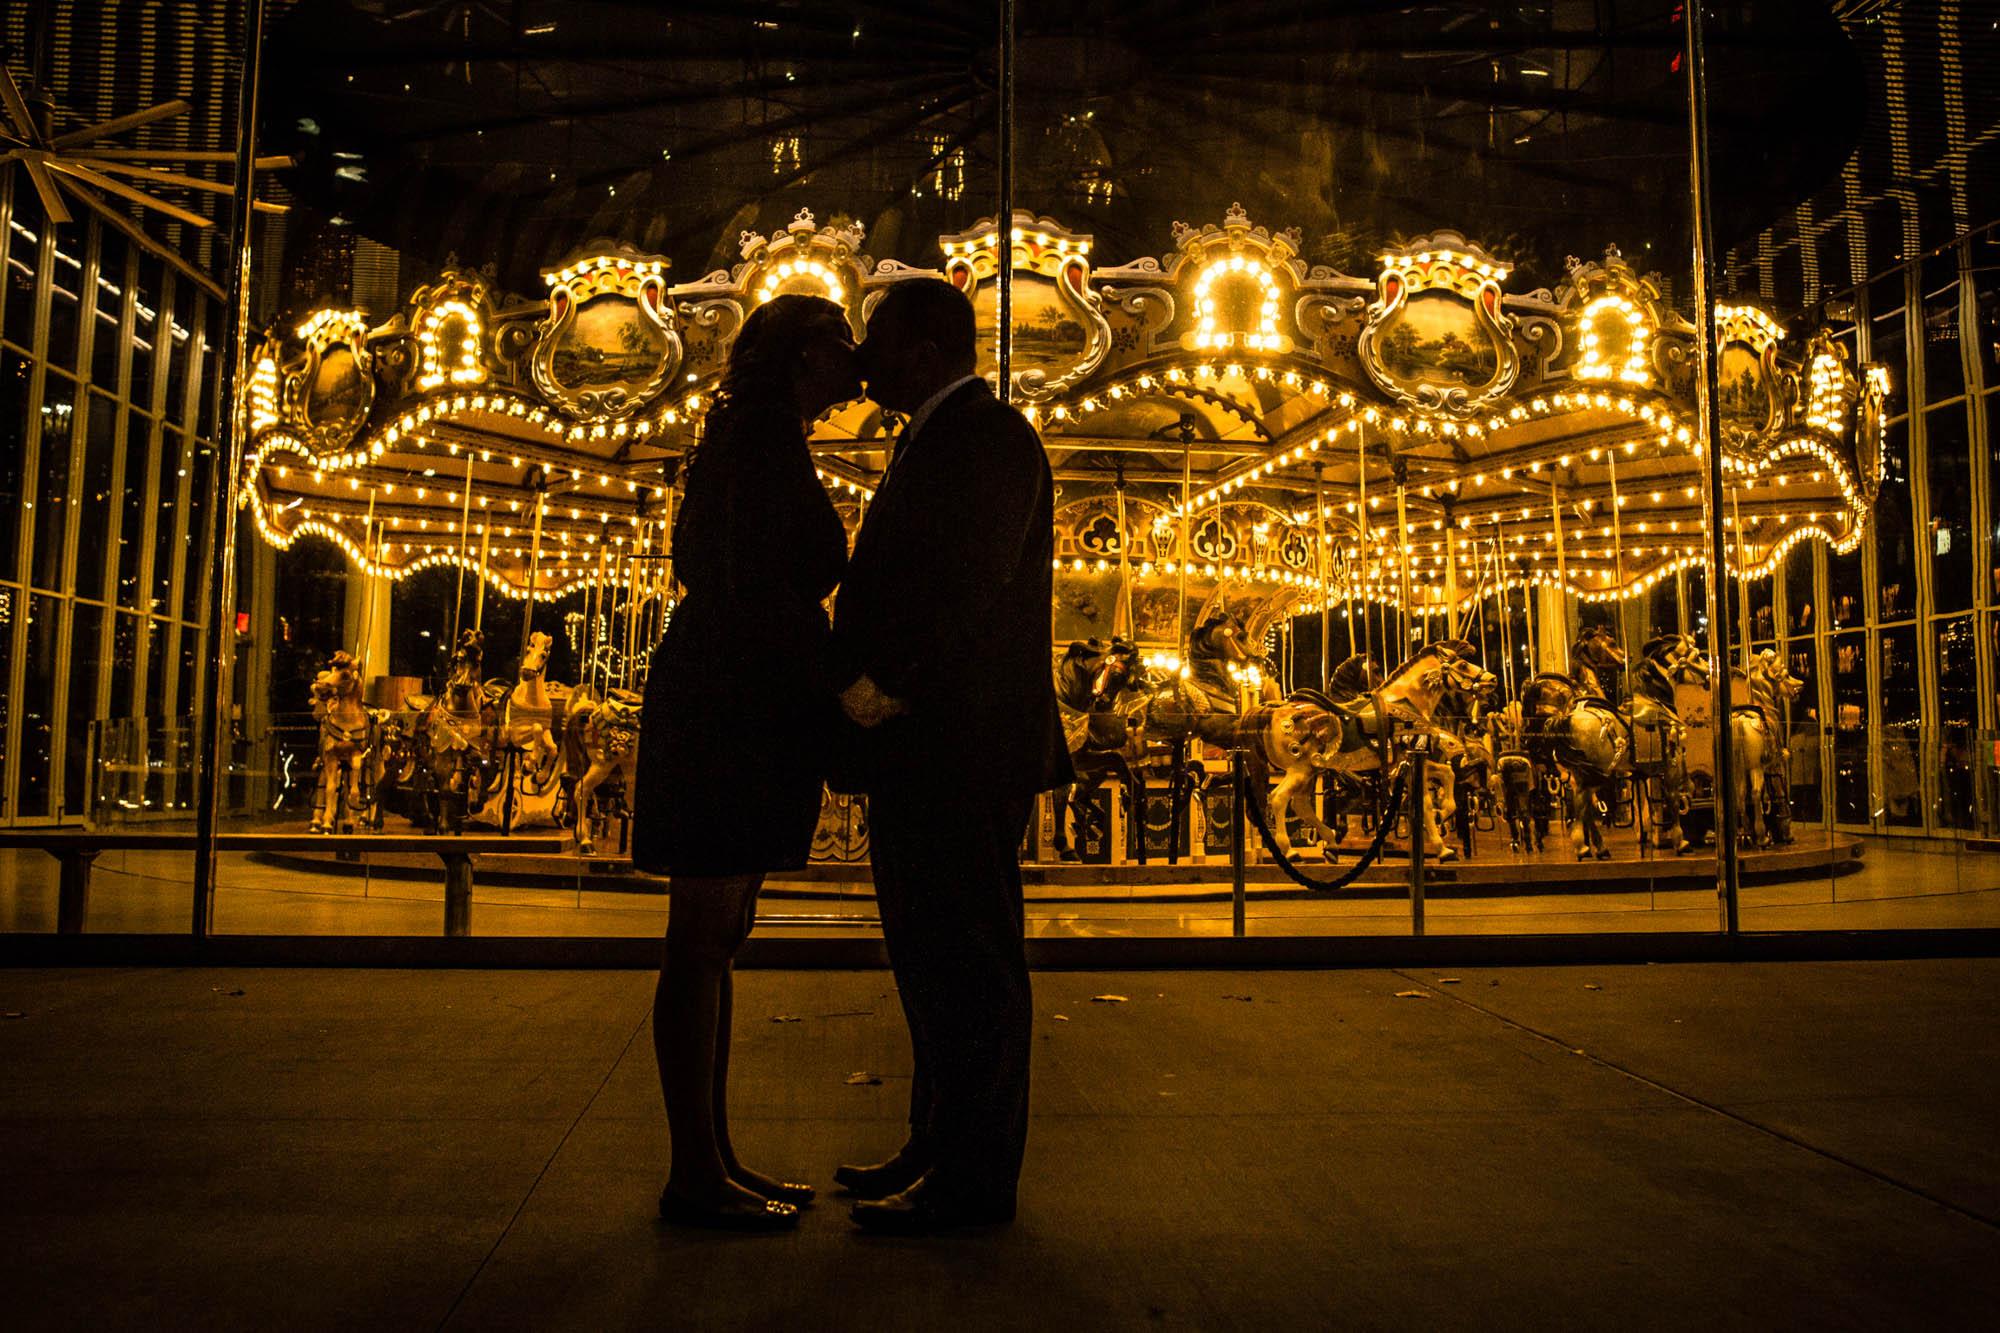 scranton_wedding_photographer_lettieri_pa (11 of 12).jpg